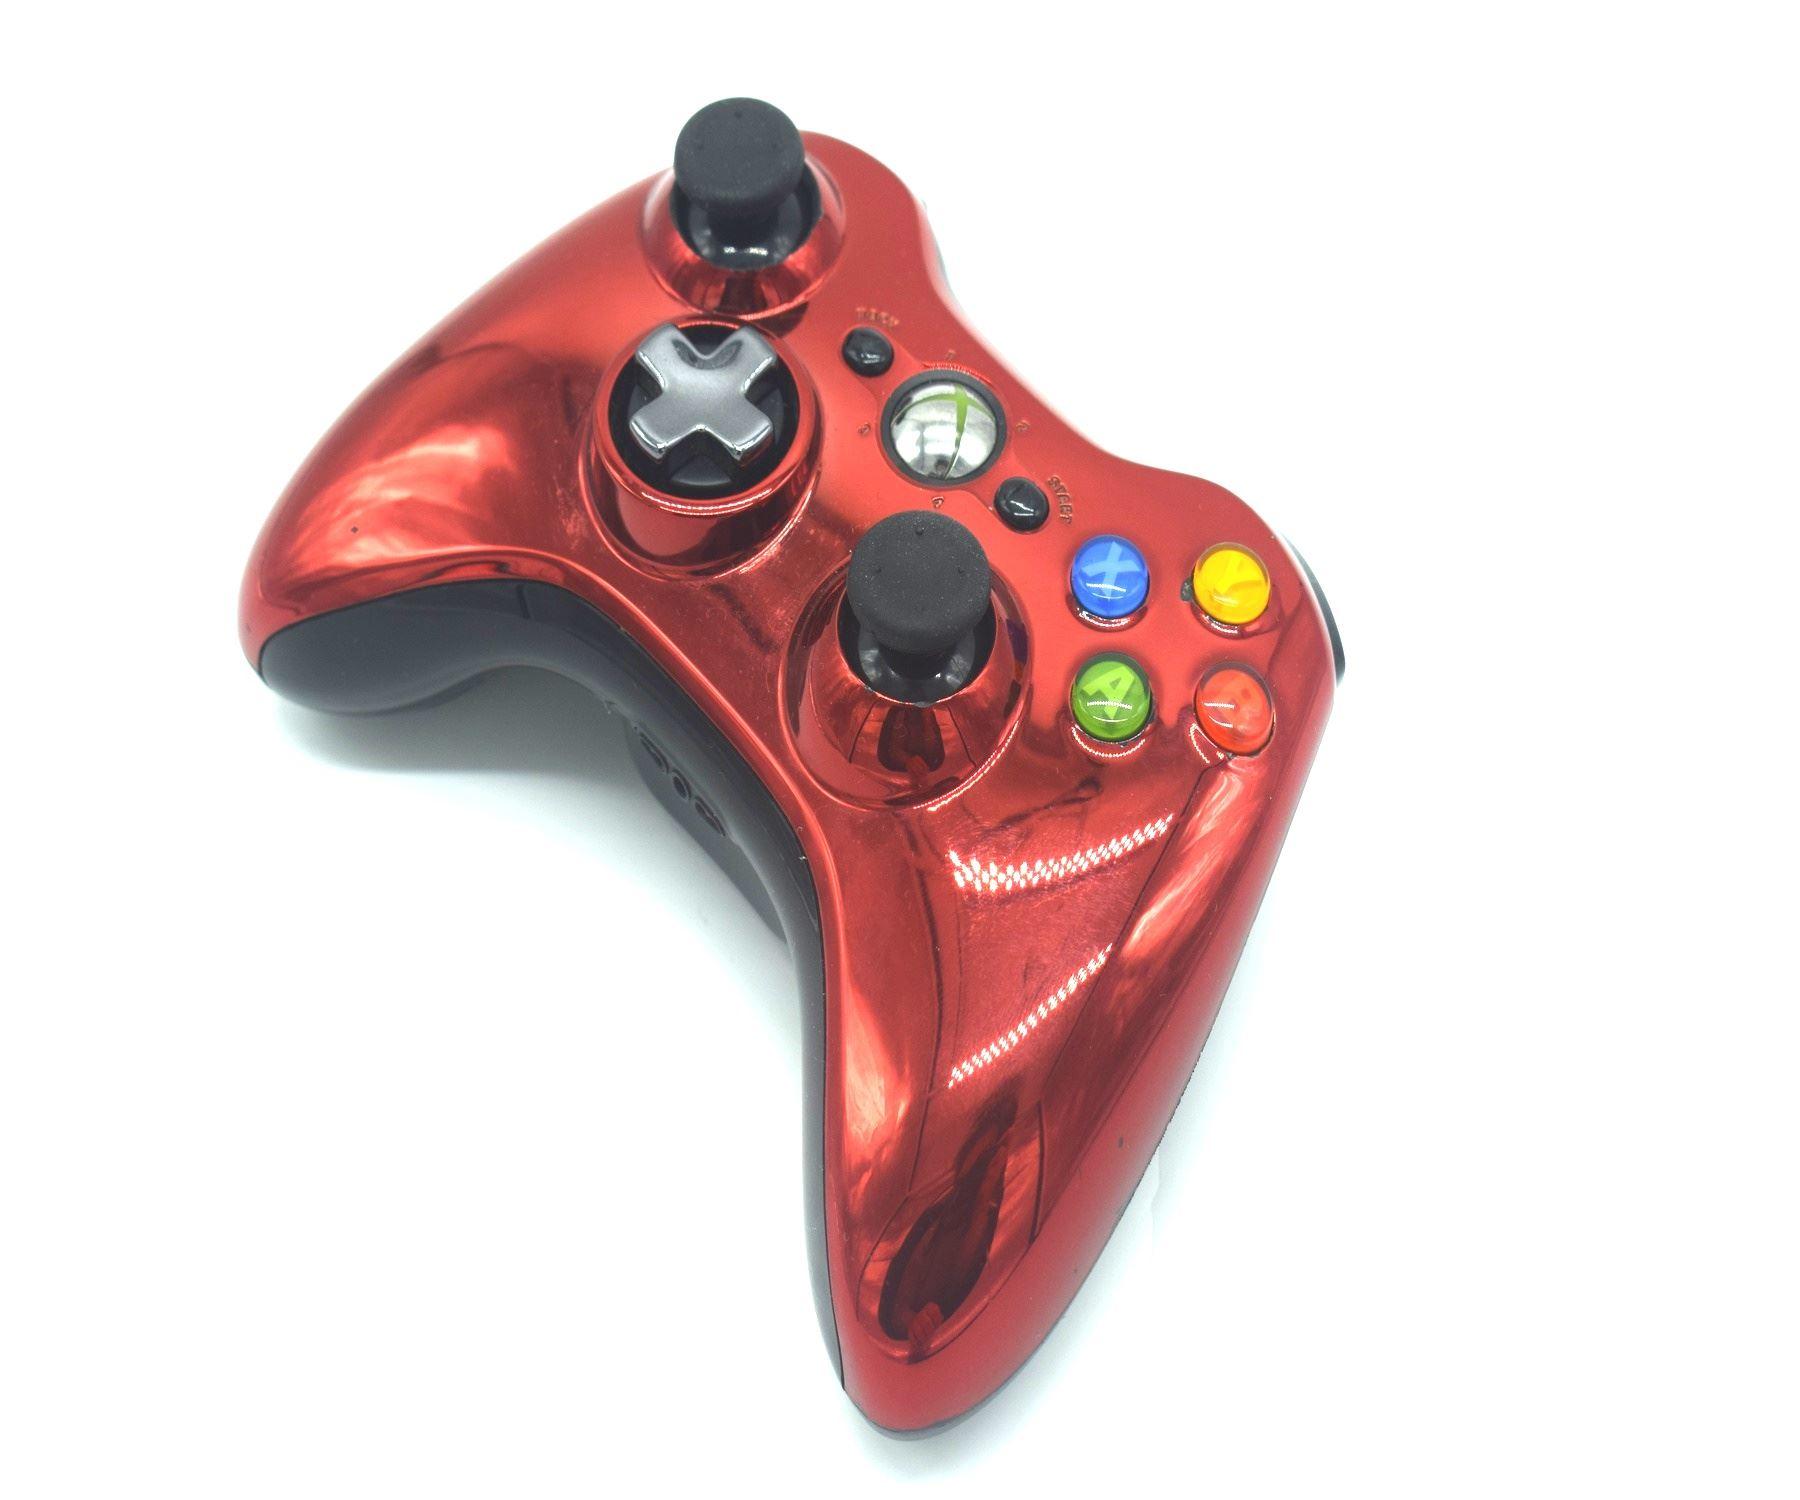 Official-Original-Genuine-Microsoft-Xbox-360-Controller-Pads-Various-Colours thumbnail 25